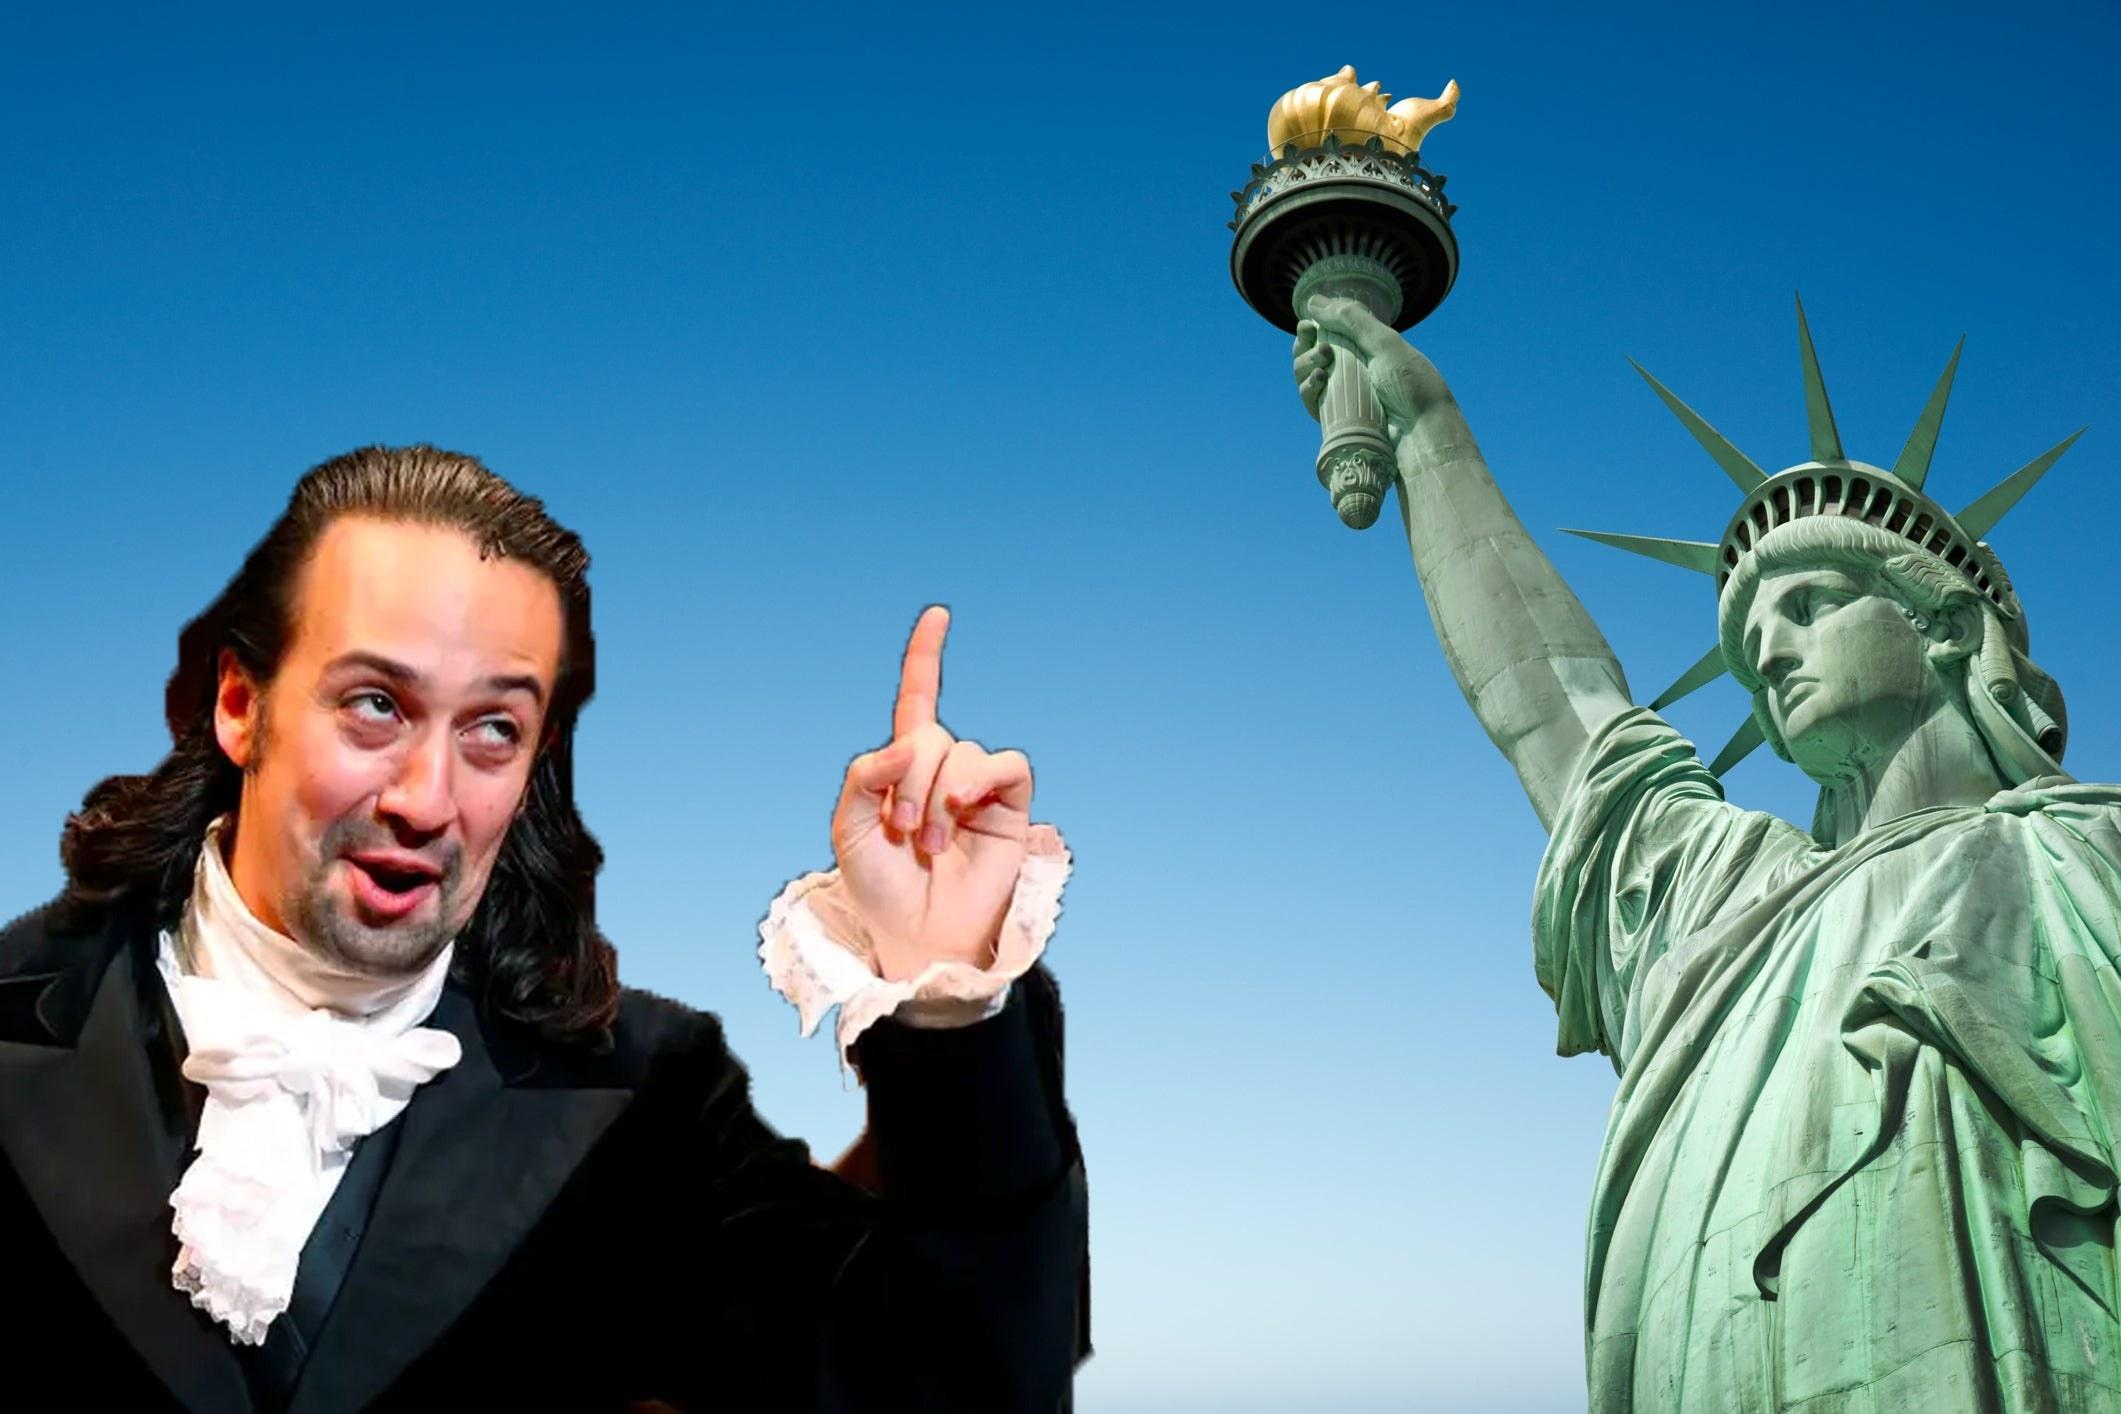 Hamilton and Statue of Liberty